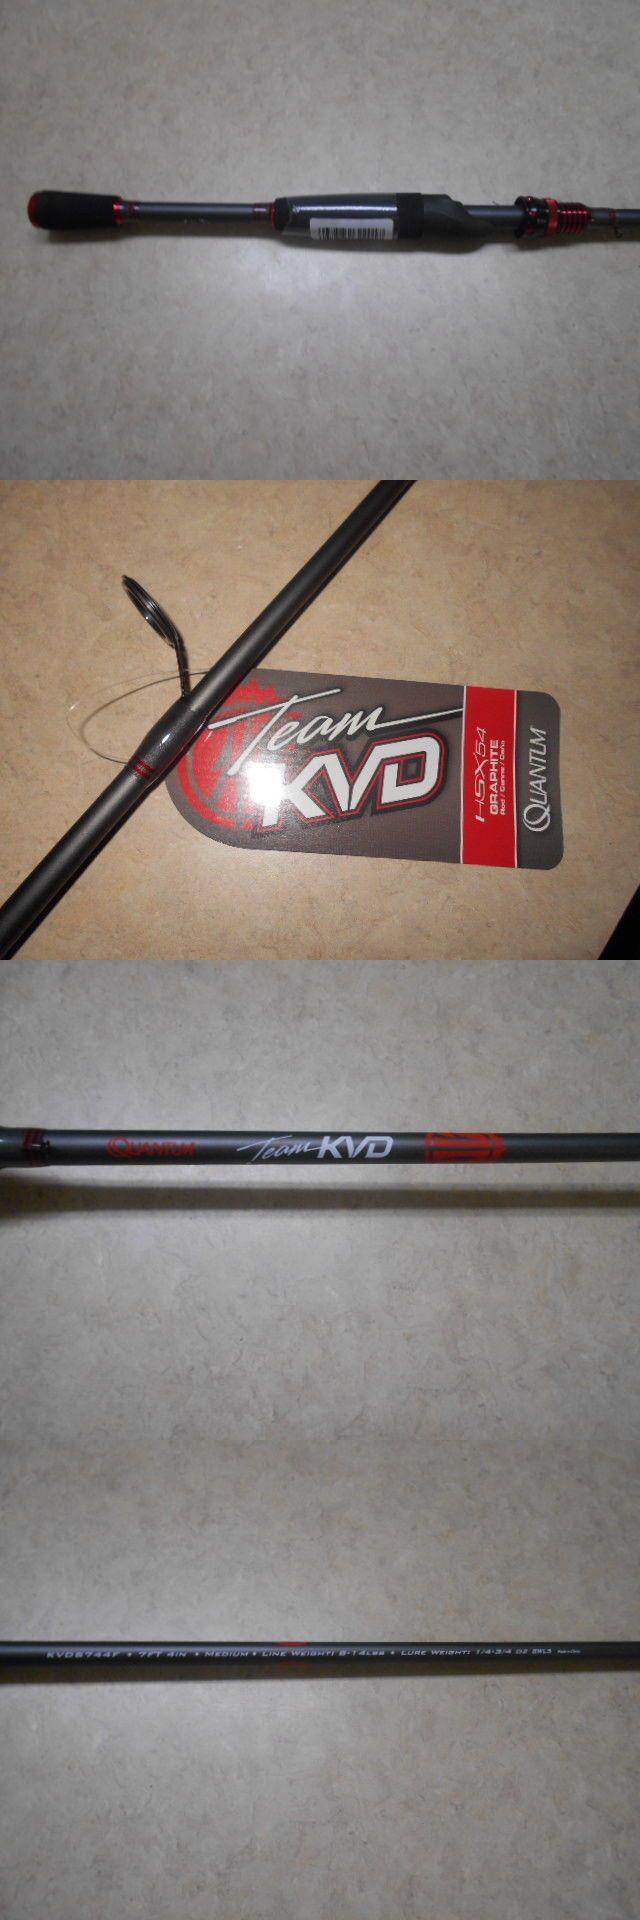 Spinning Rods 36150: New Style Quantum Kvd Team 7 Ft. 4 In. Medium Action Kvds744f Spinning Rod -> BUY IT NOW ONLY: $45 on eBay!